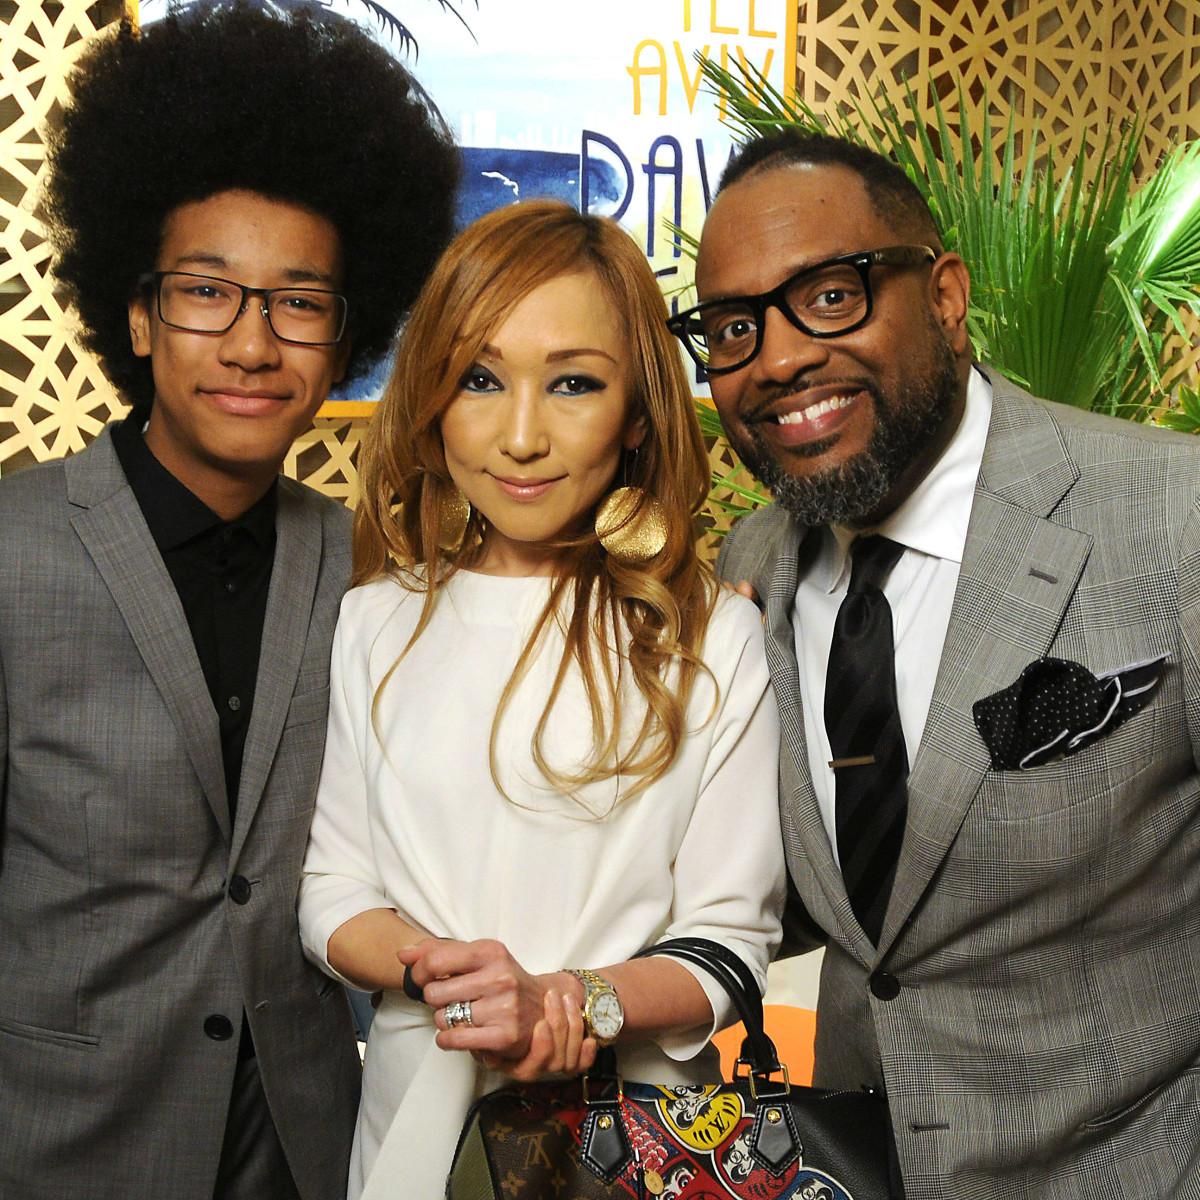 Daiji, Kay and Daniel Bertrand